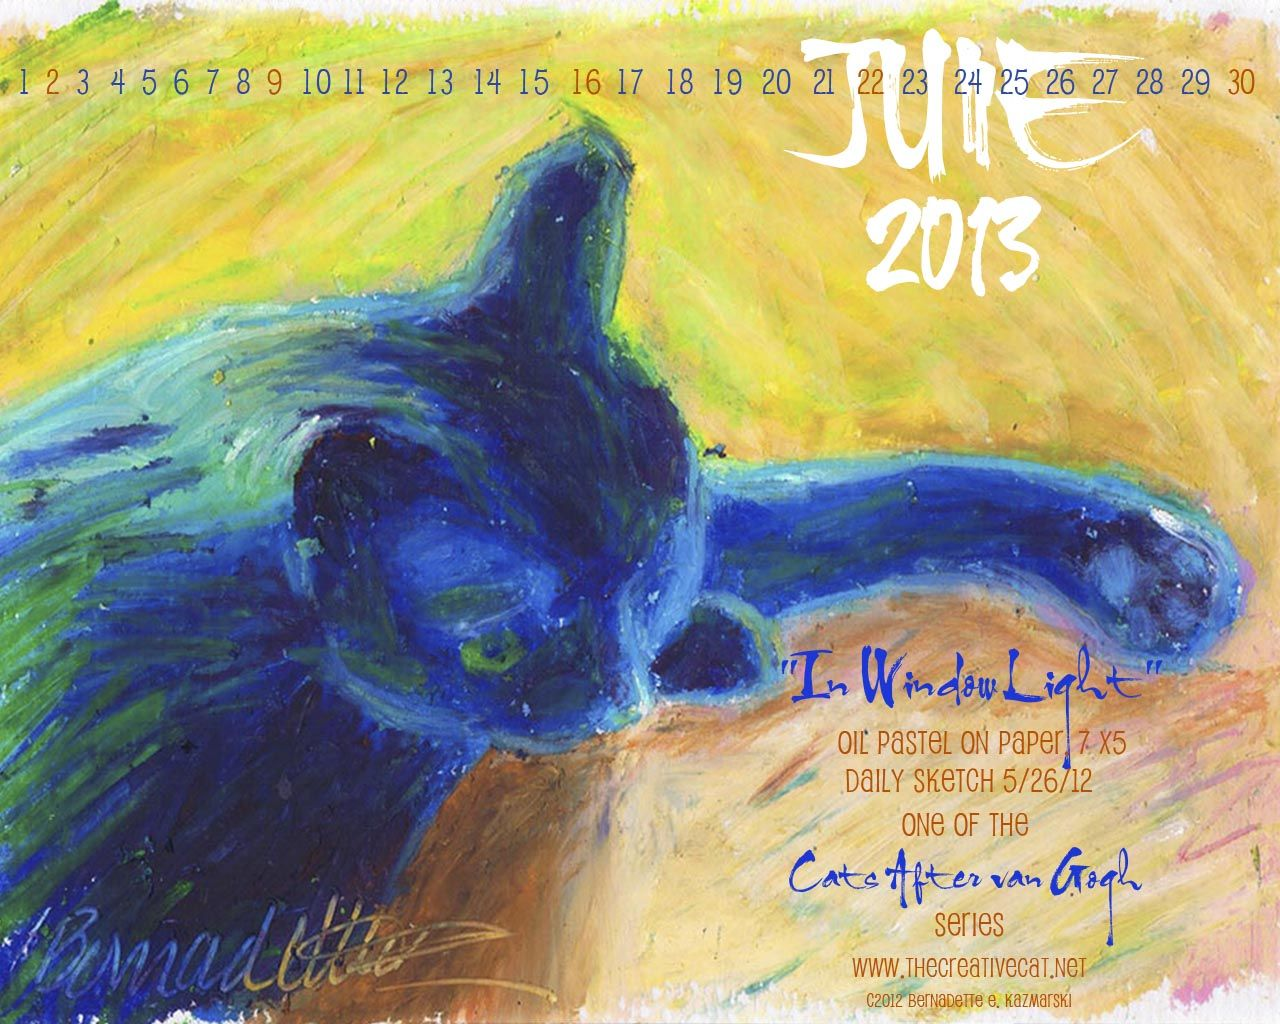 June Featured Artwork and Desktop Calendar by Bernadette E. Kazmarski